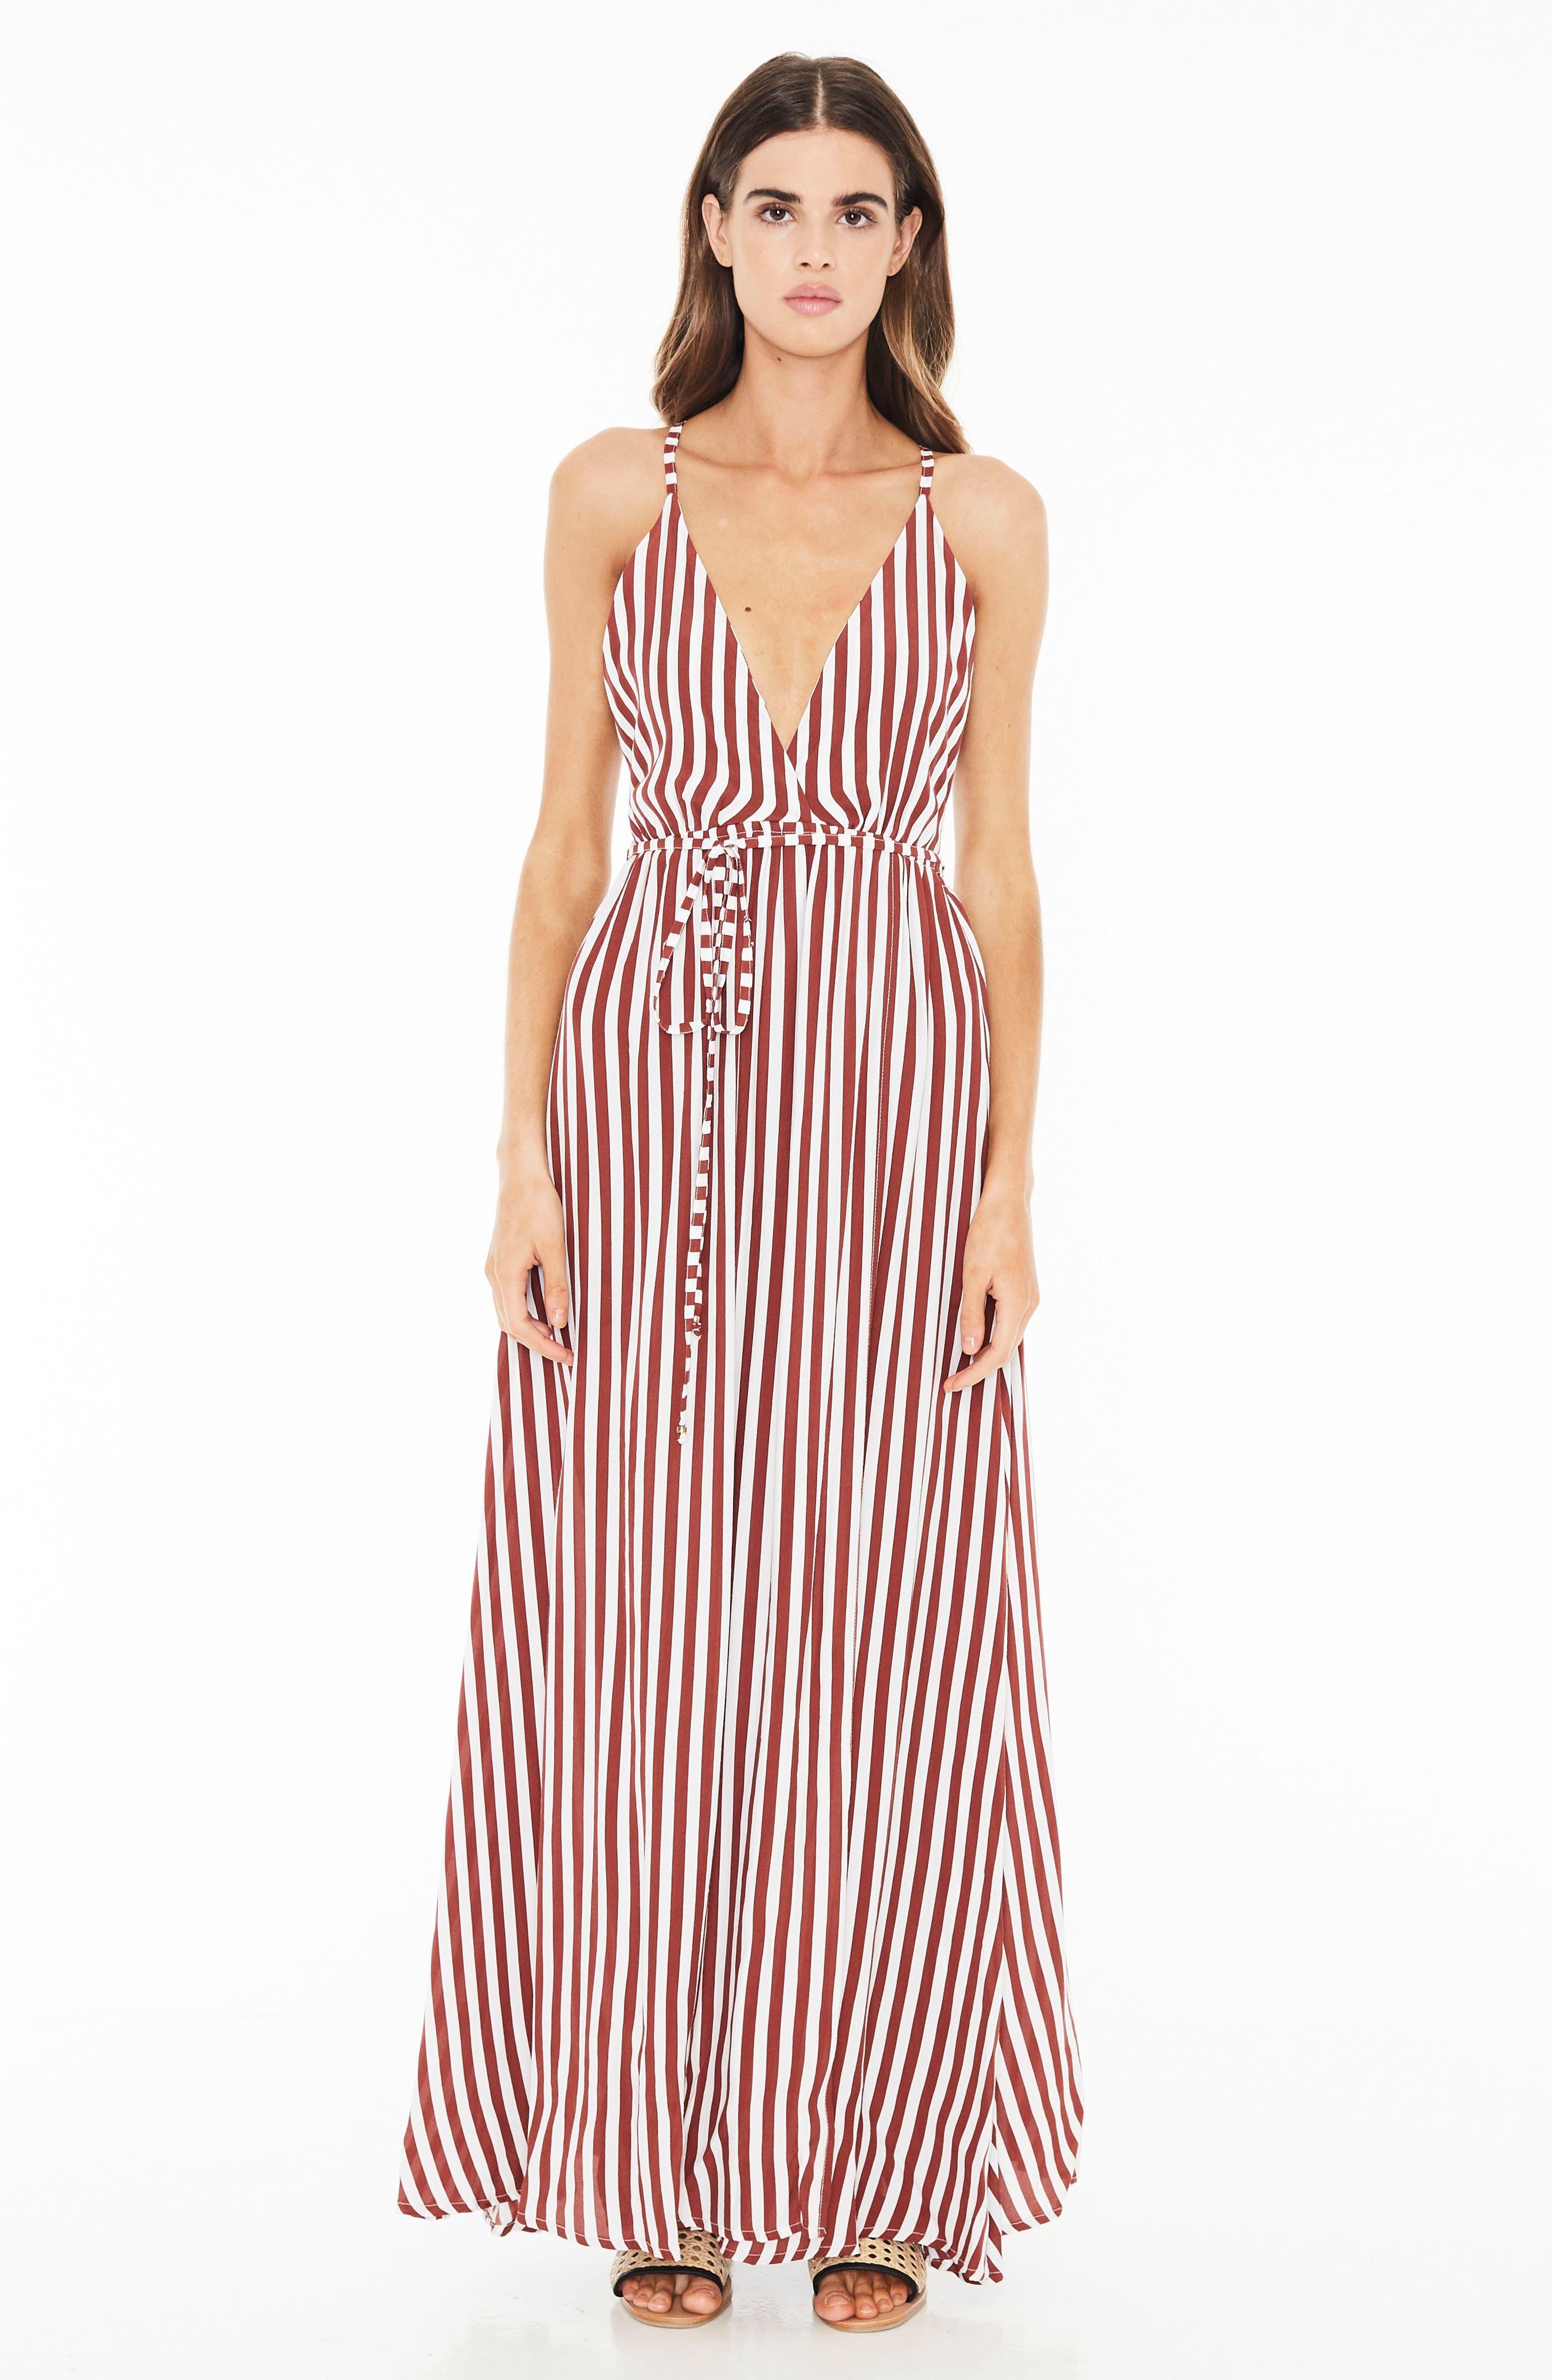 Santa Rosa Maxi Dress,                             Alternate thumbnail 4, color,                             Zeus Stripe Prints - Maroon